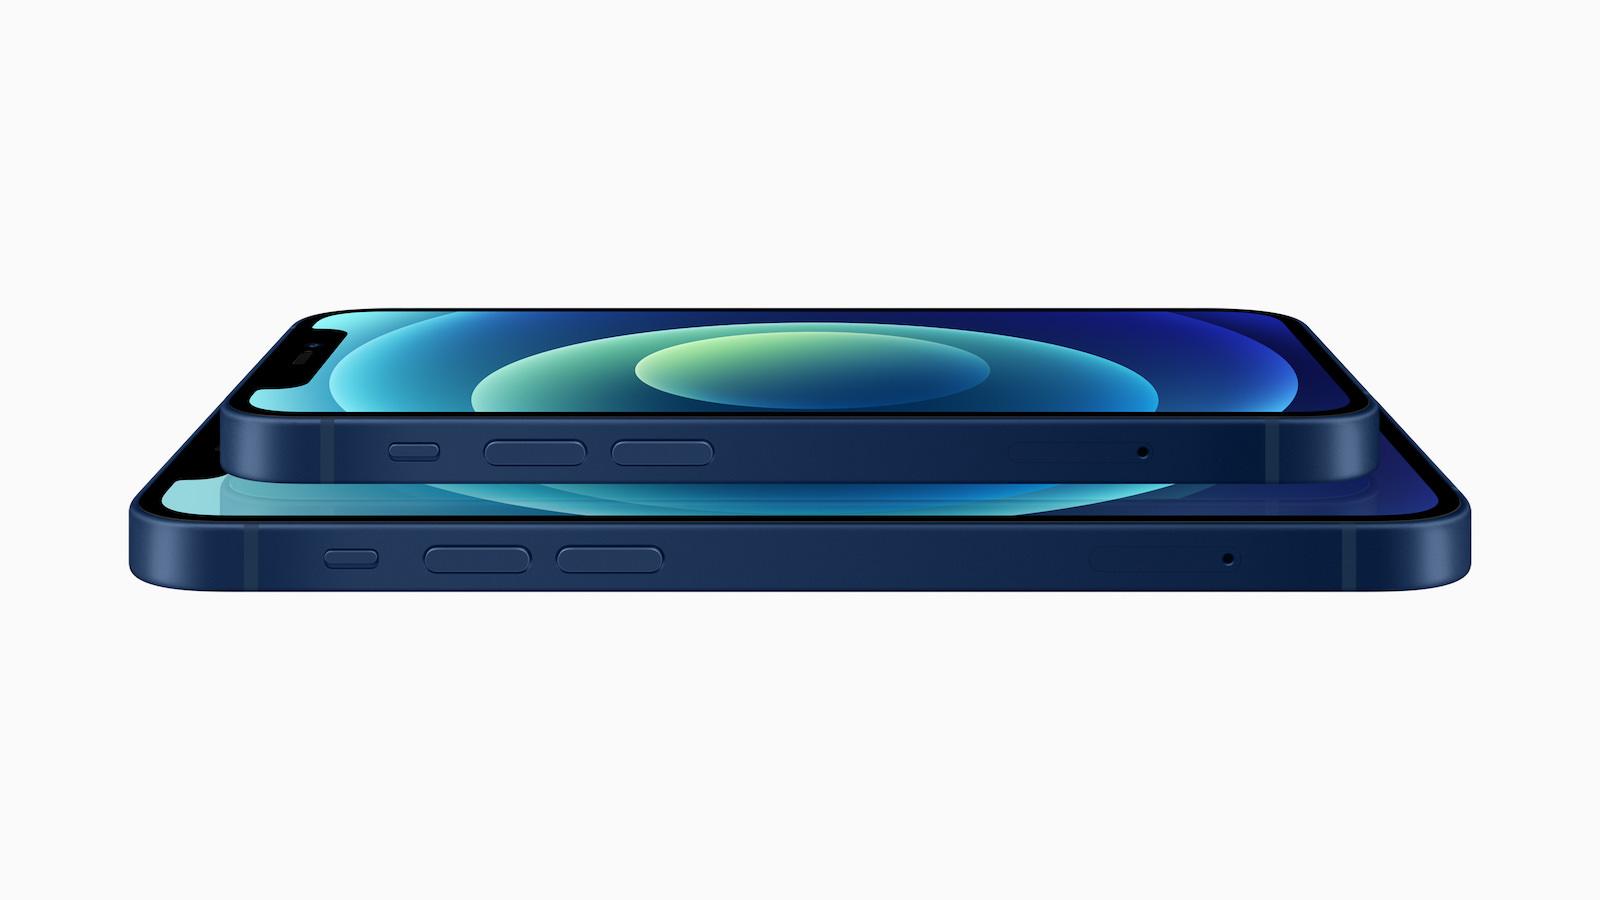 apple_iphone-12_super-retina-xdr-display_10132020.jpg